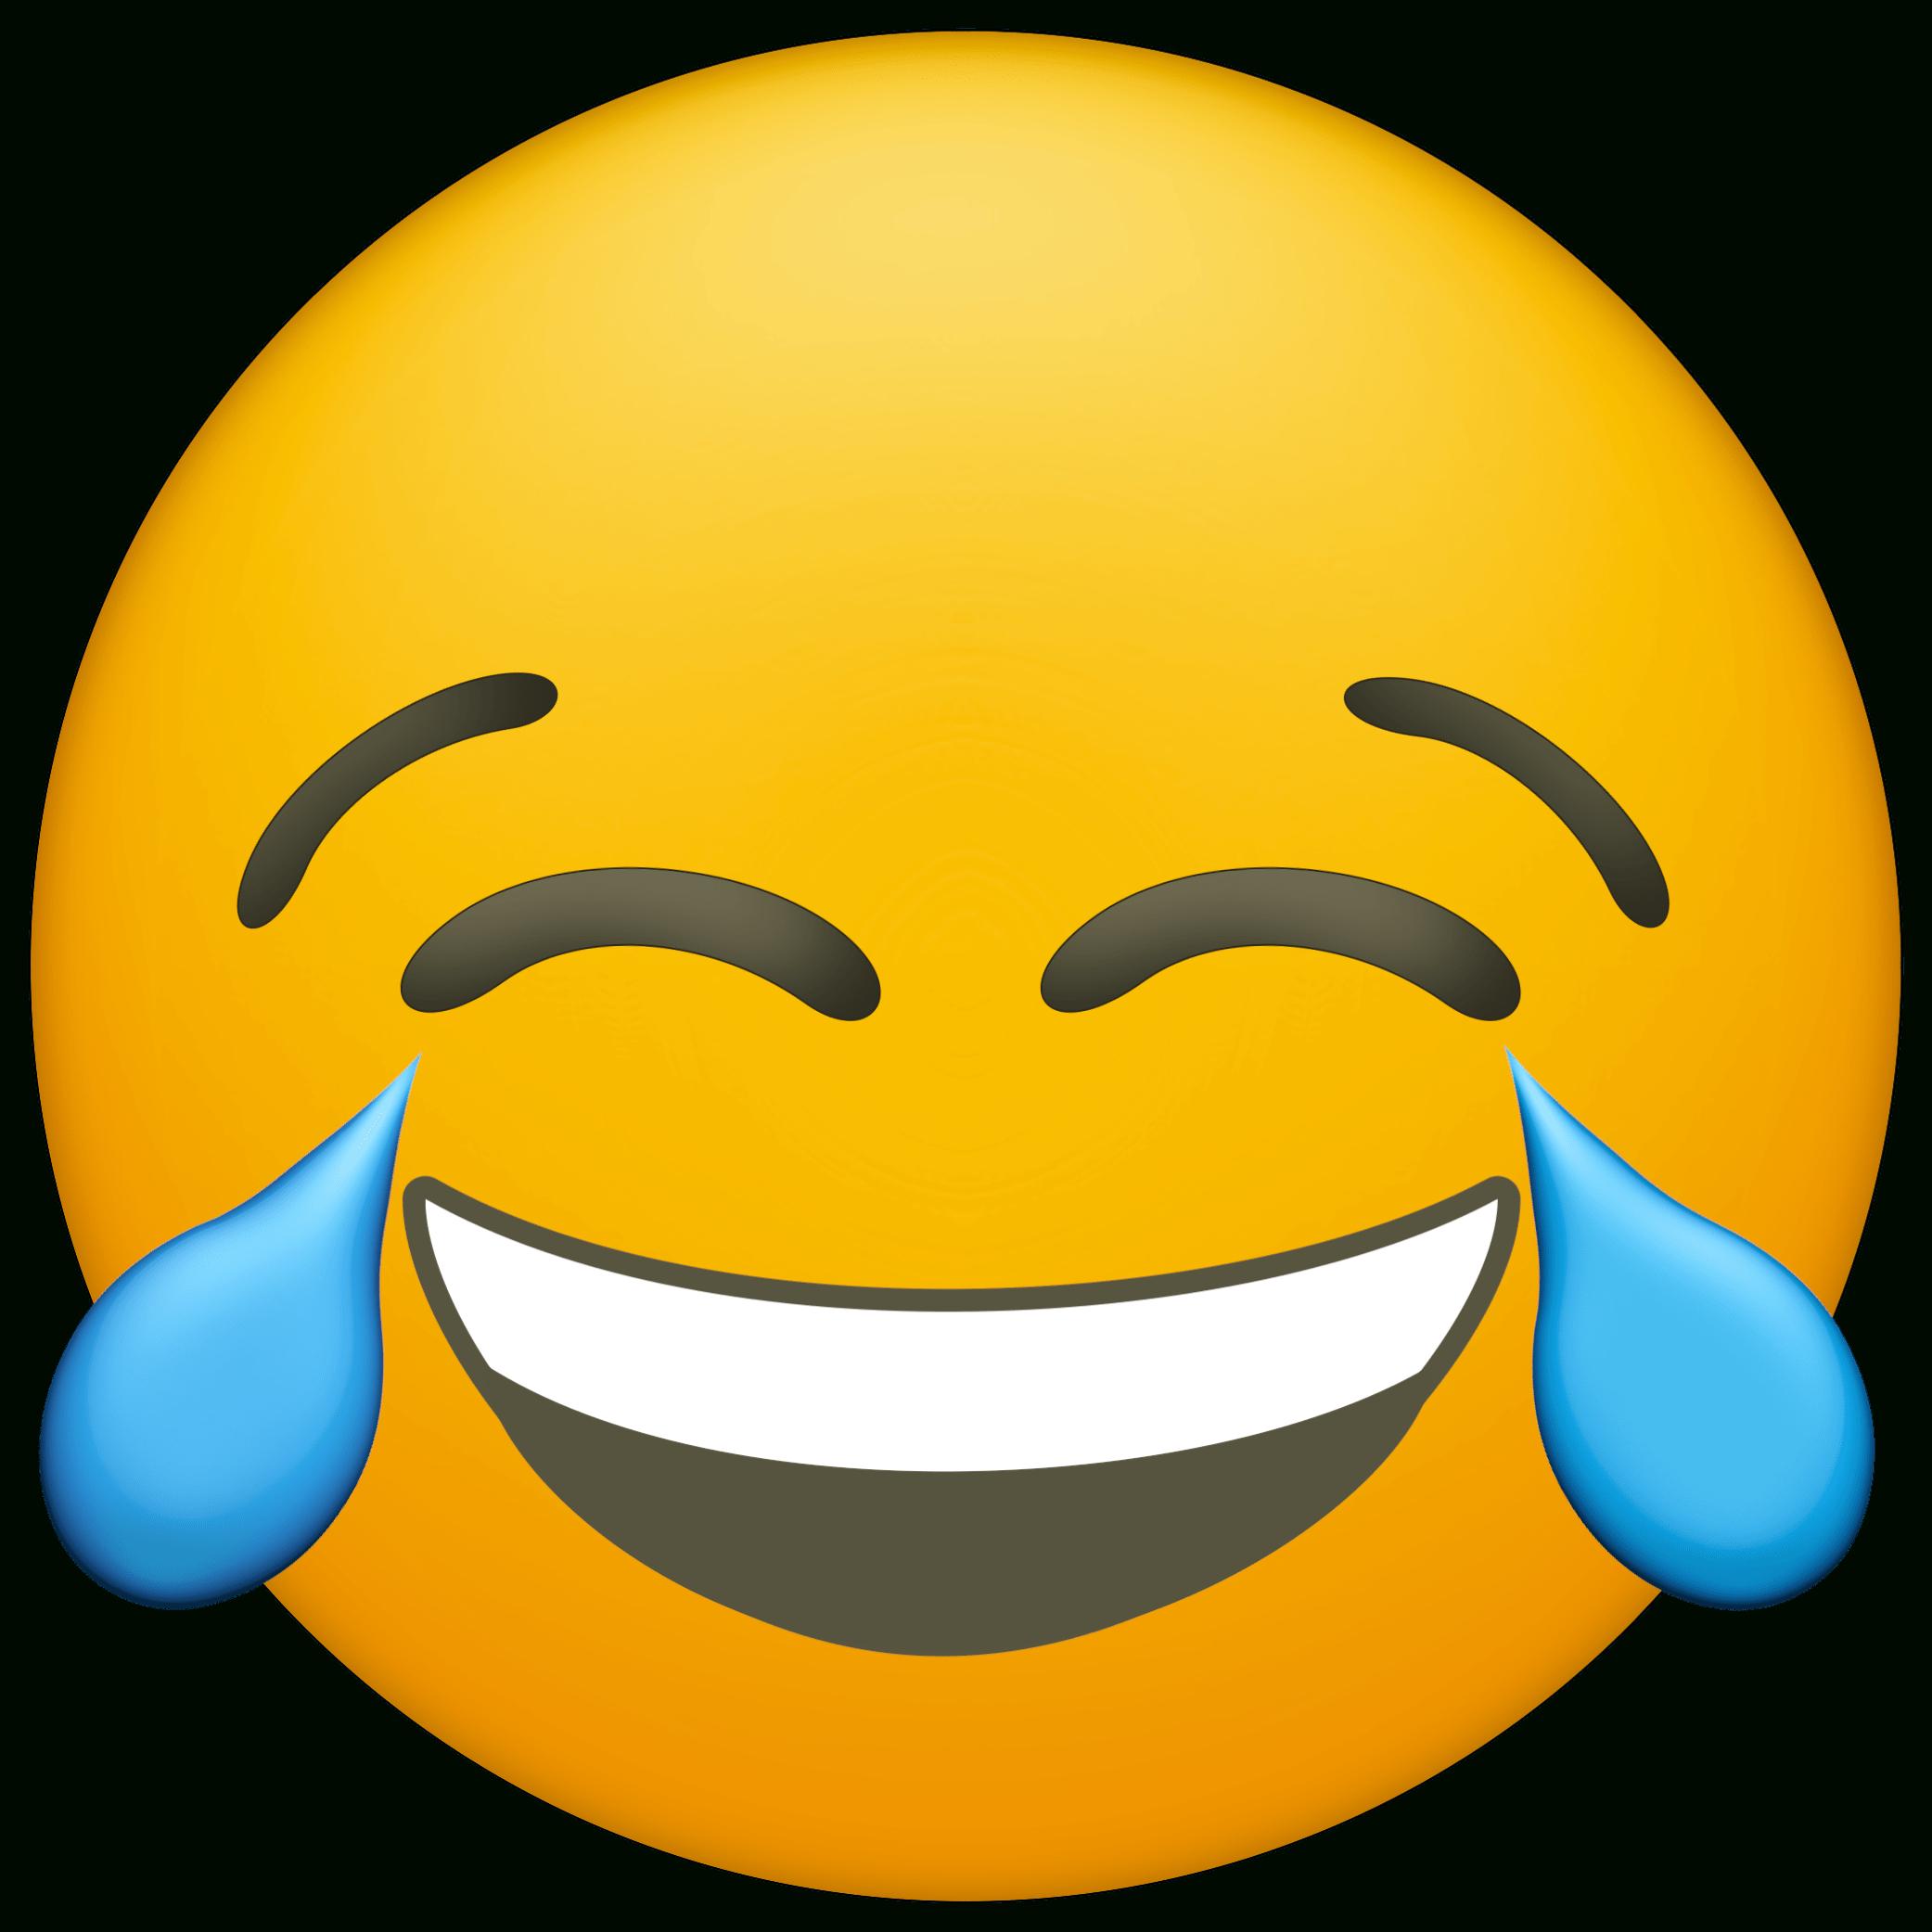 Emoji Faces Printable {Free Emoji Printables} - Paper Trail Design - Free Emoji Printables